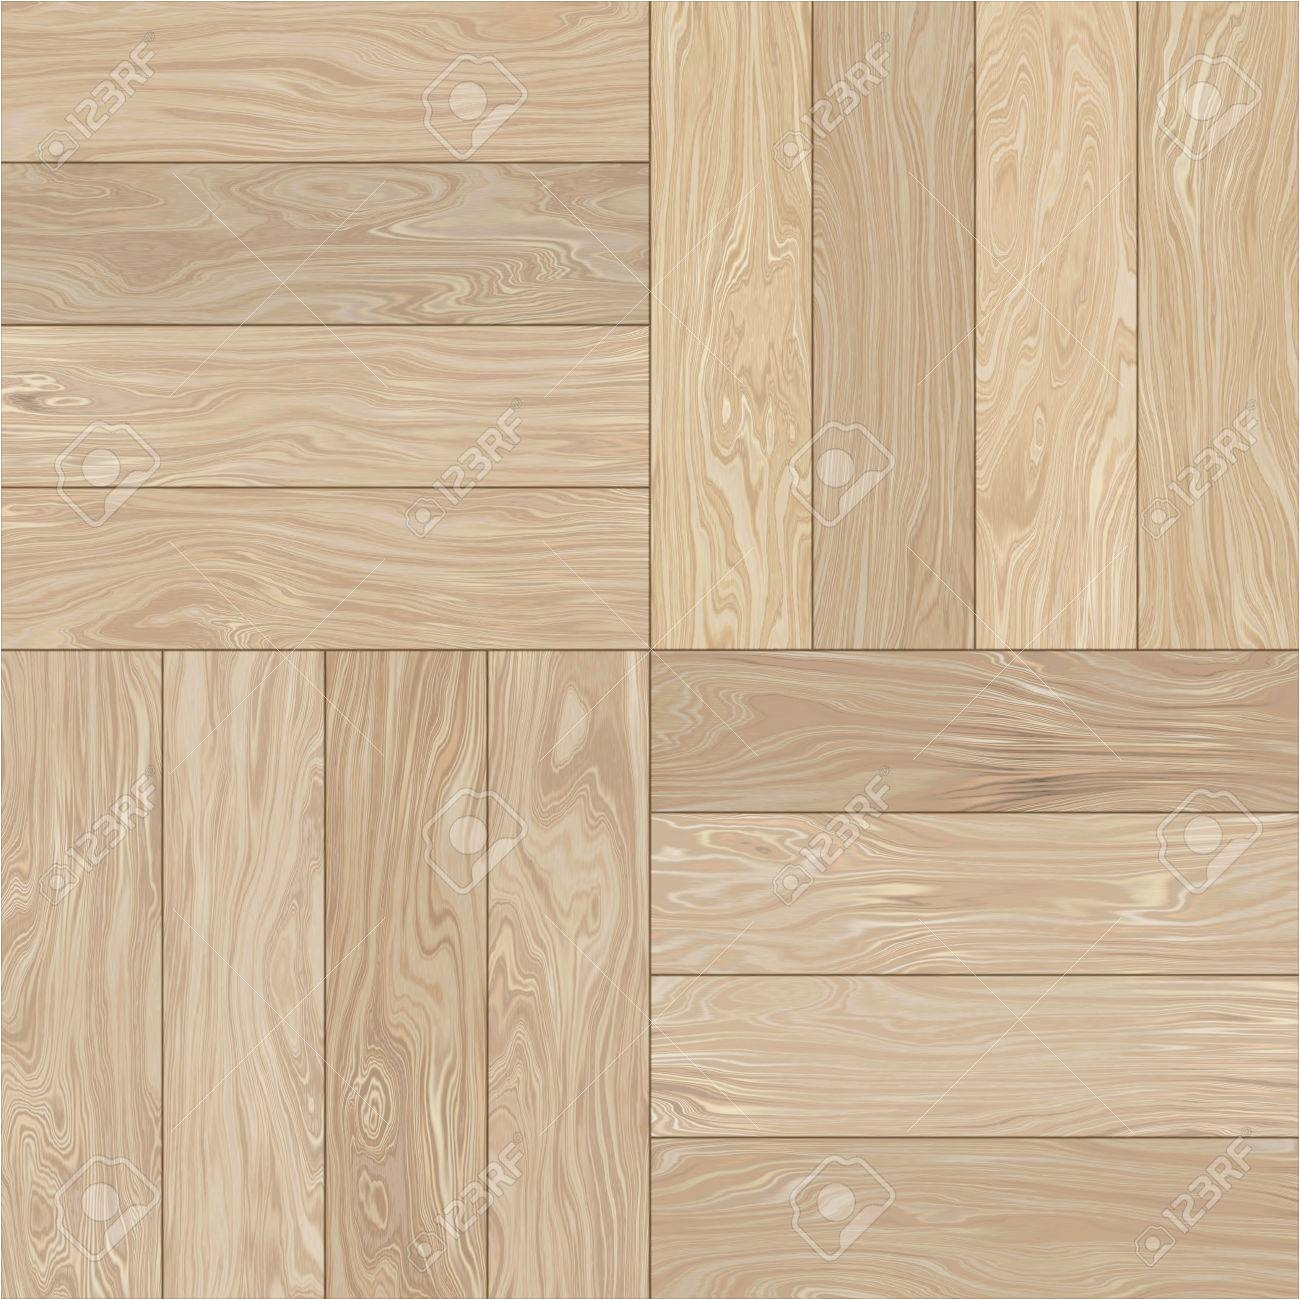 engineered hardwood flooring vs hardwood flooring of wooden floor texture bradshomefurnishings in wooden floor texture wood floor background seamless background wooden texture parquet